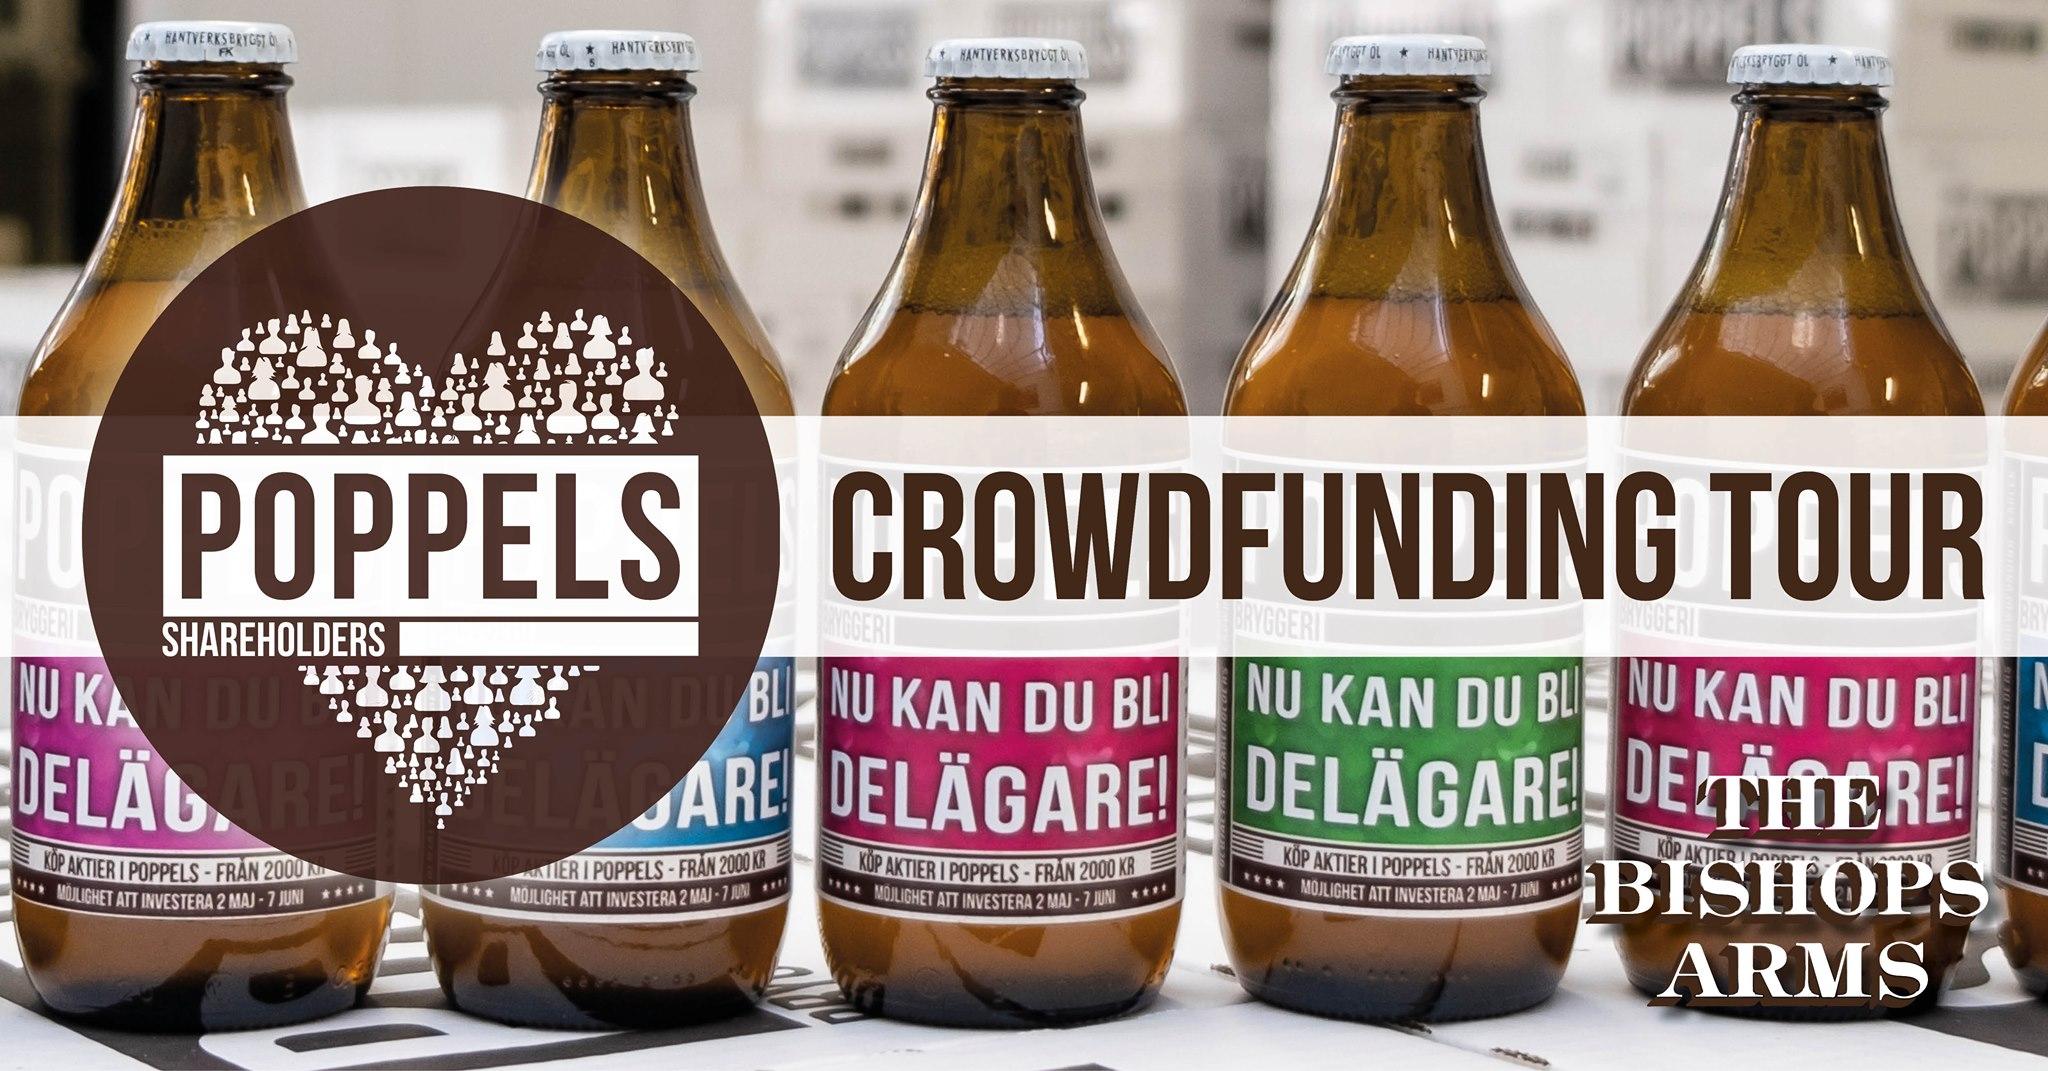 Poppels crowdfunding.